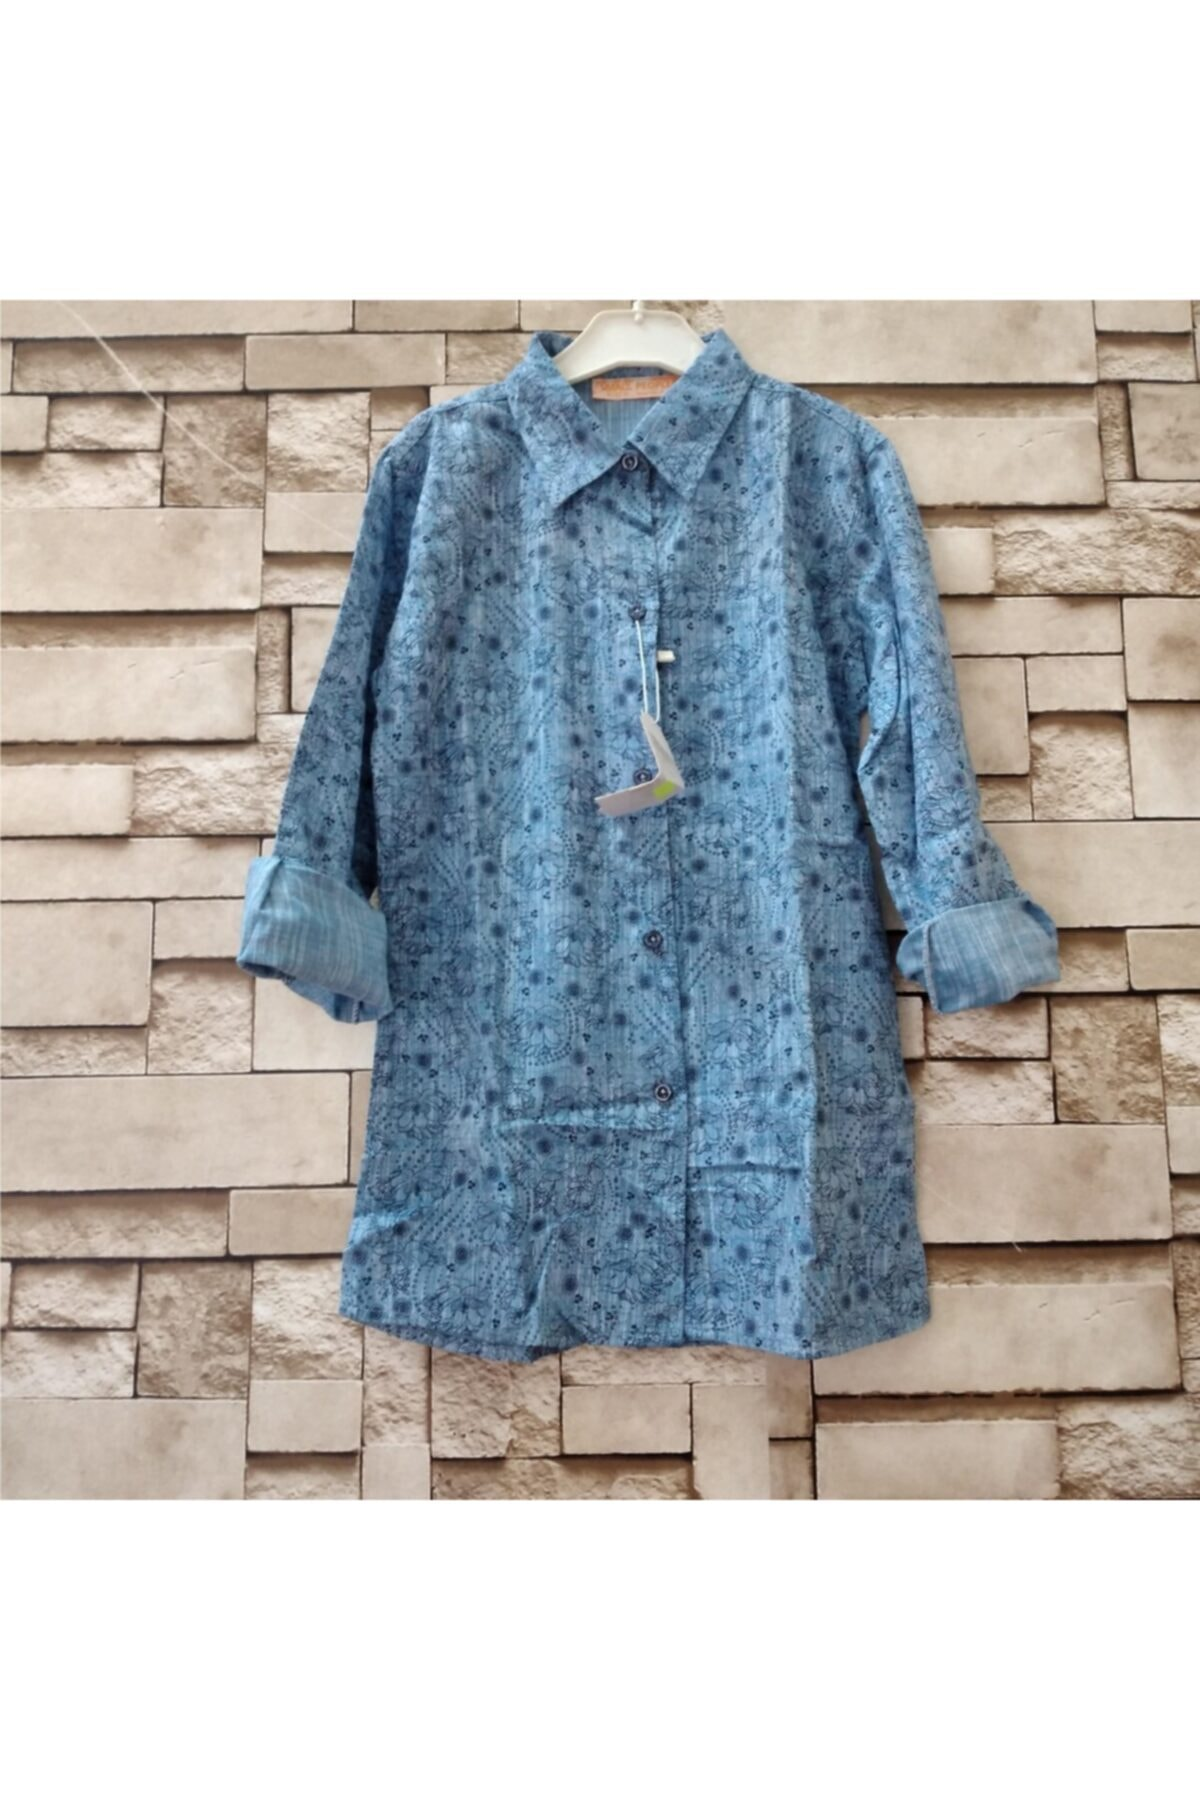 تونیک دخترانه ست برند Öykü Butik رنگ آبی کد ty95704248